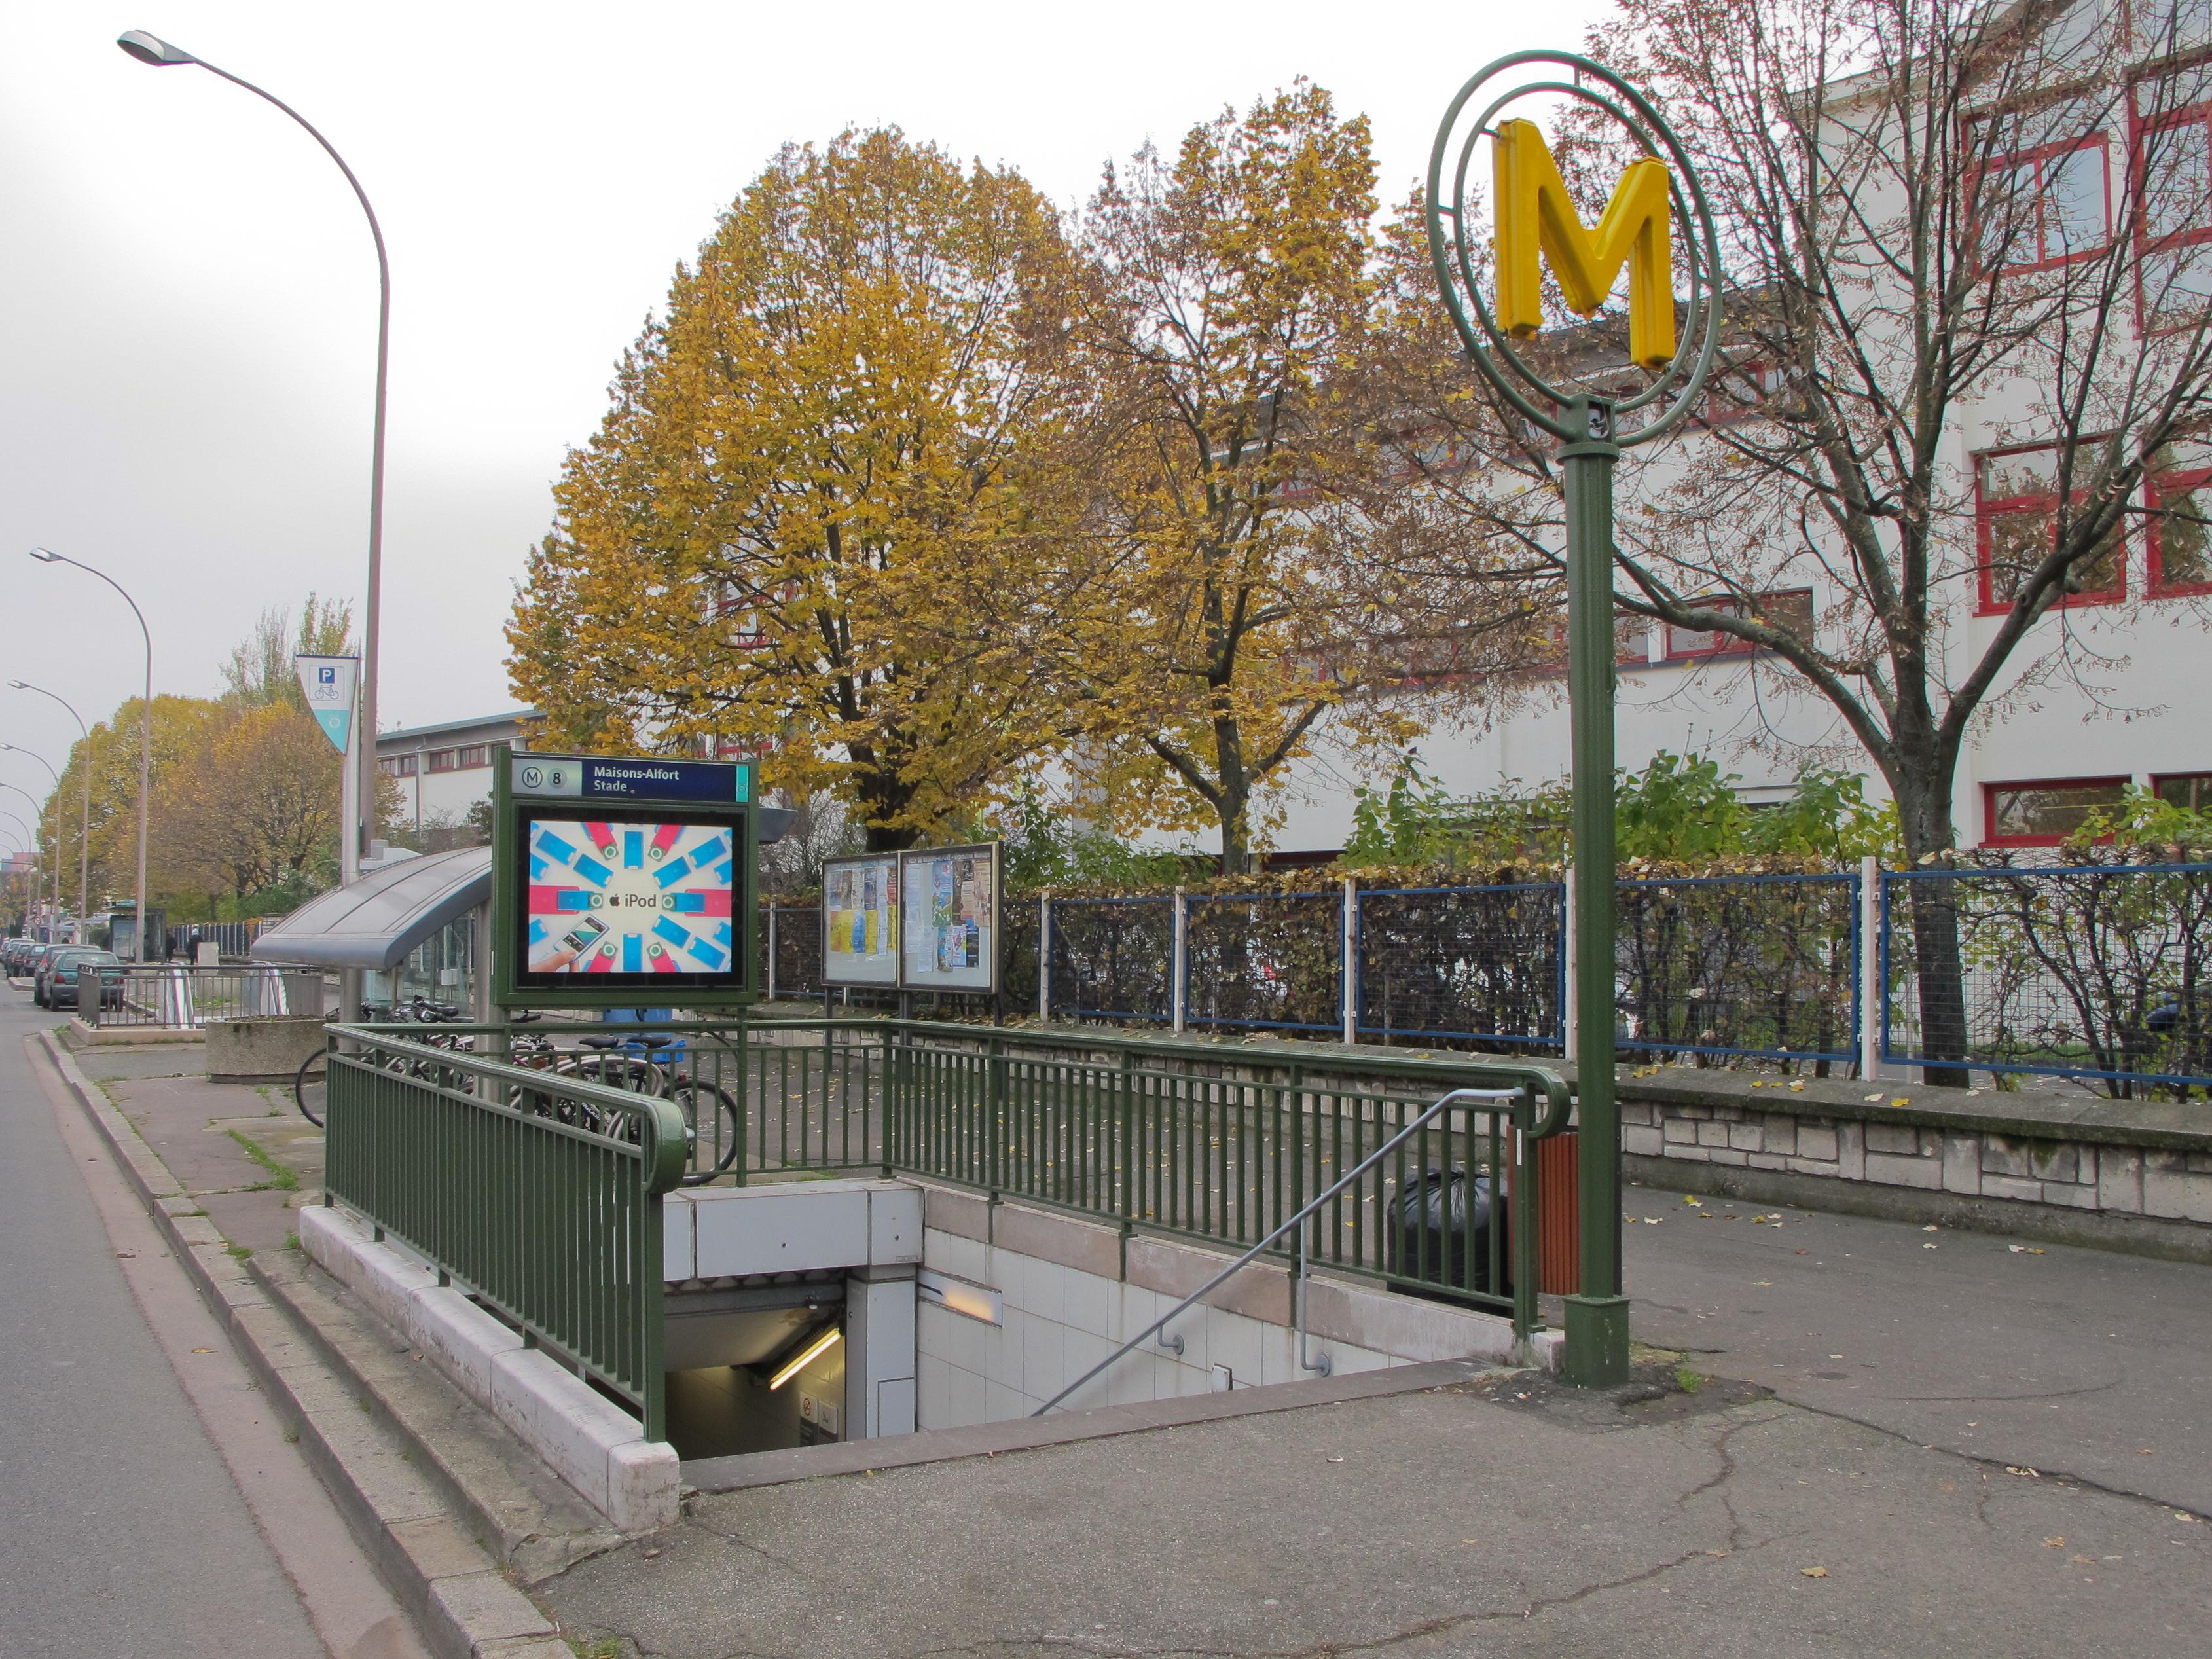 Maisons Alfort Stade Metro De Paris Wikipedia